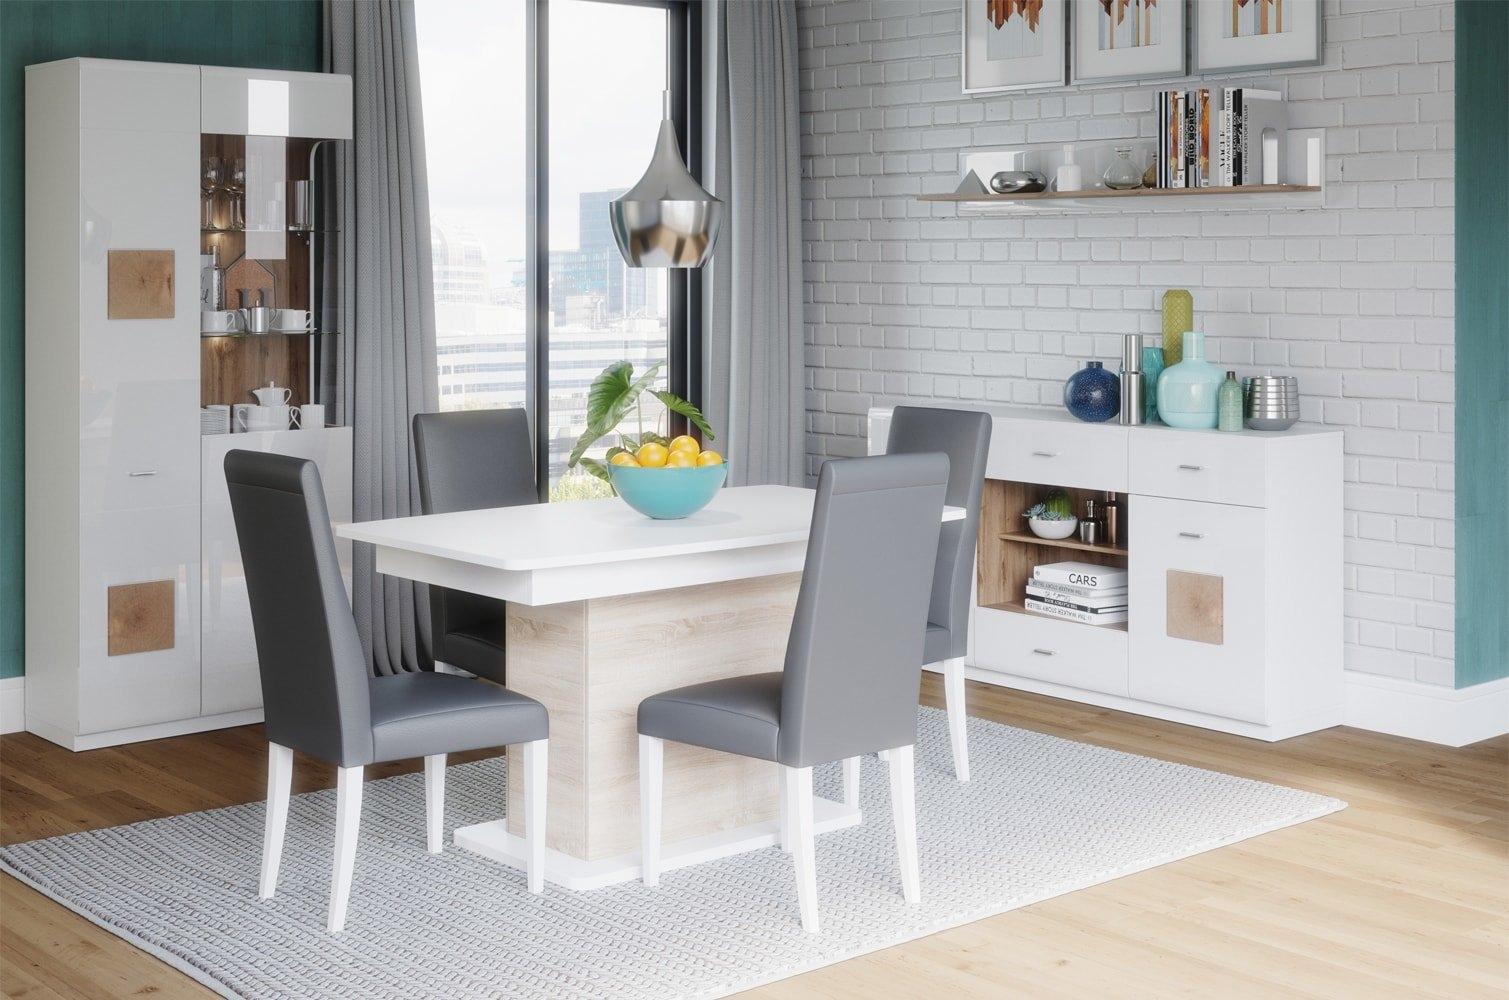 Set de mobila dining din pal, 4 piese Wood Alb / Stejar Wotan imagine